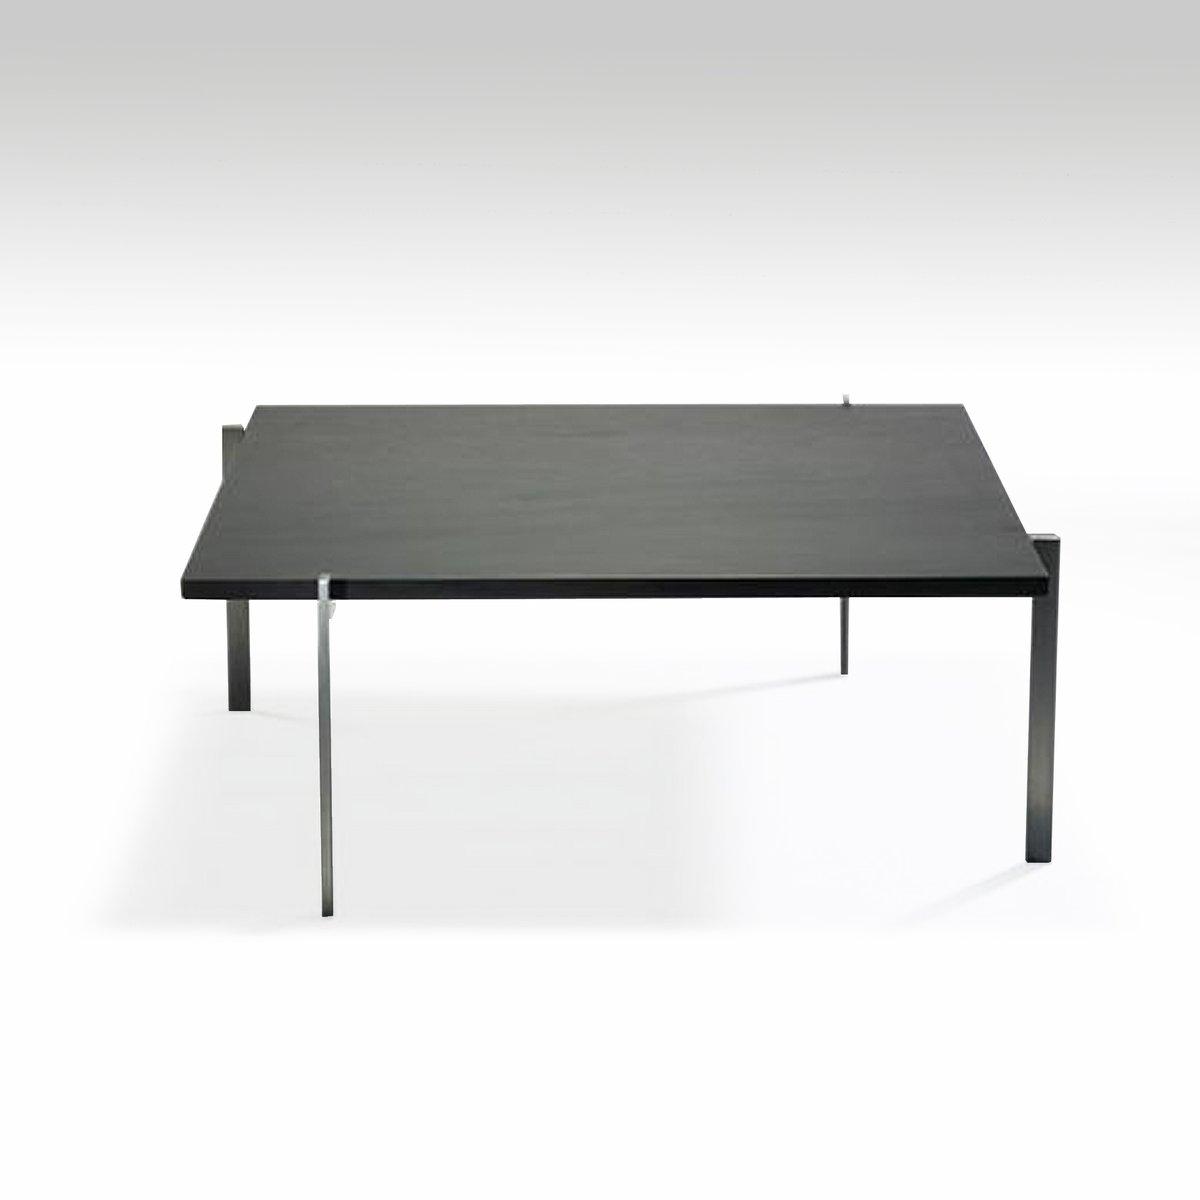 poul kjaerholm furniture. pk61 slate coffee table by poul kjaerholm for e kold christensen furniture